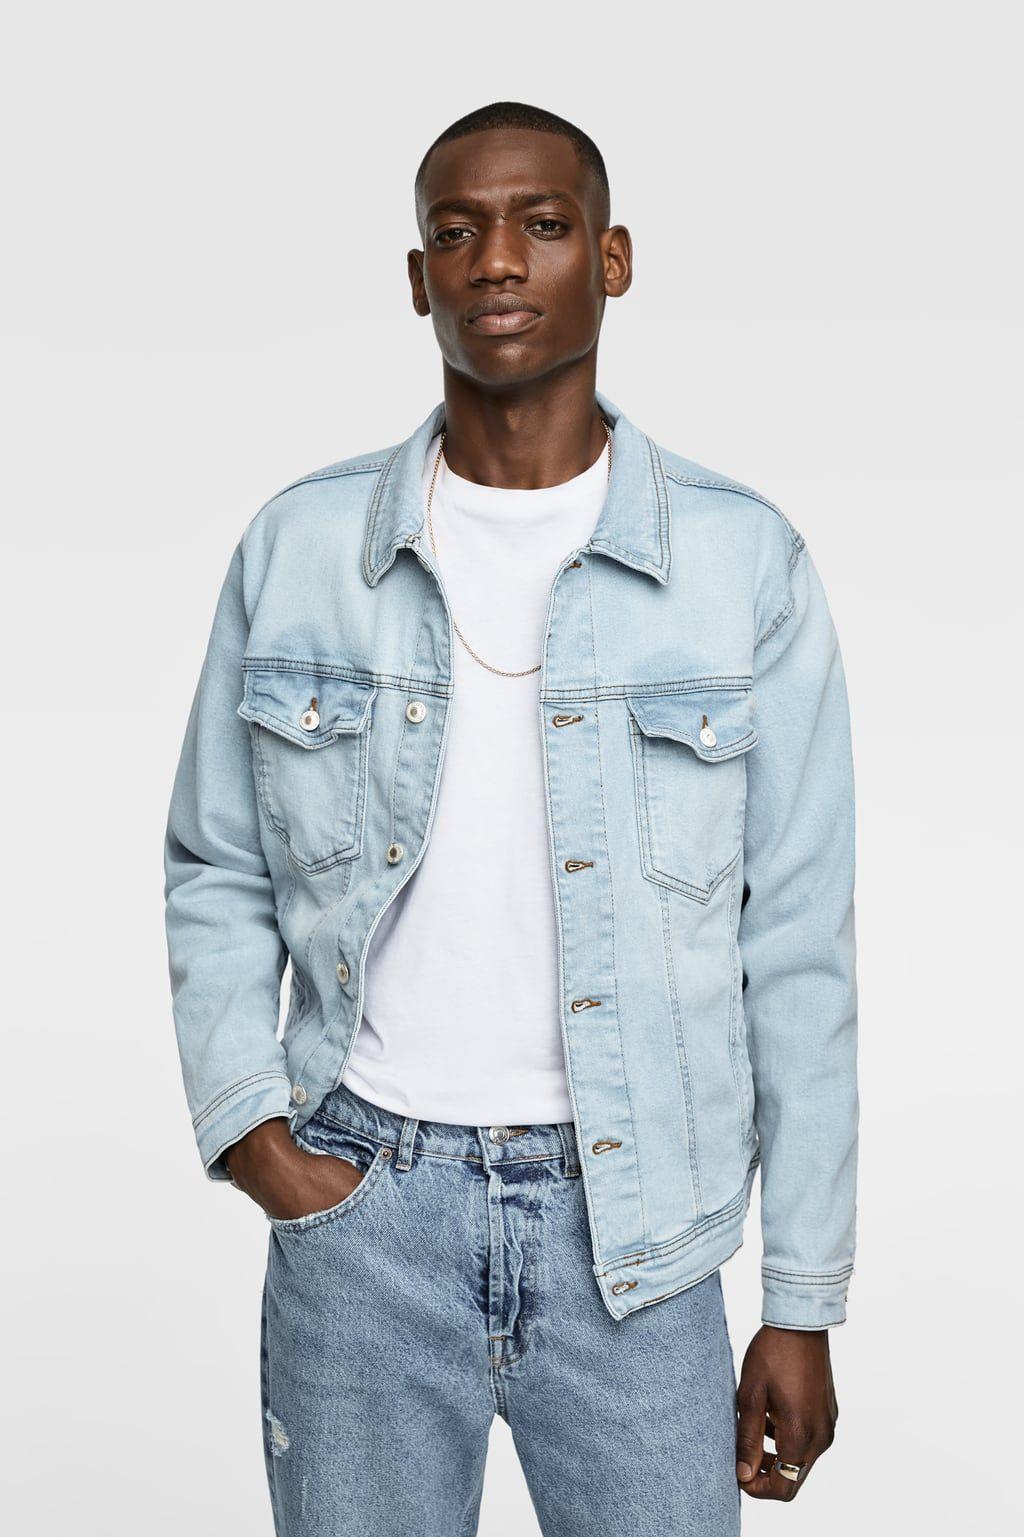 Https Www Zara Com Fr Fr Veste En Jean Basique P04454322 Html V1 8380860 Denim Jacket Mens Clothing Styles Jackets [ 1537 x 1024 Pixel ]